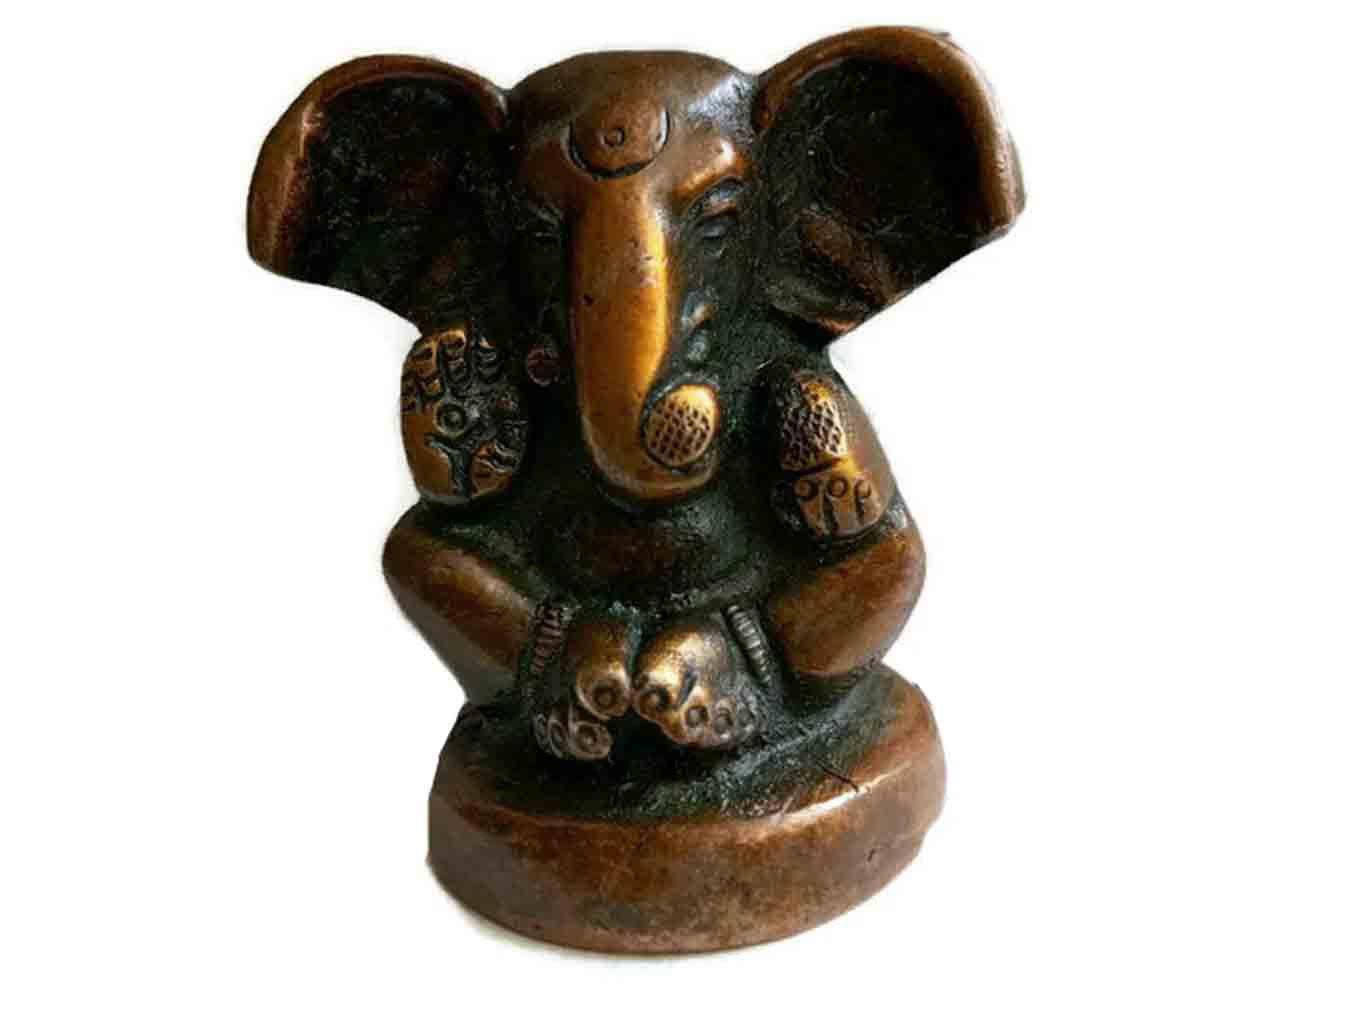 KVR真鍮供養Hindu Idol神ガネーシャ神Ganapati Riddhi Siddhi Vinayaka Bappa Morya Statue forの先頭作業、平和と繁栄 Ganesh-22 KVR~BS~546 B072N8F9NX Ganesh-22 Ganesh-22